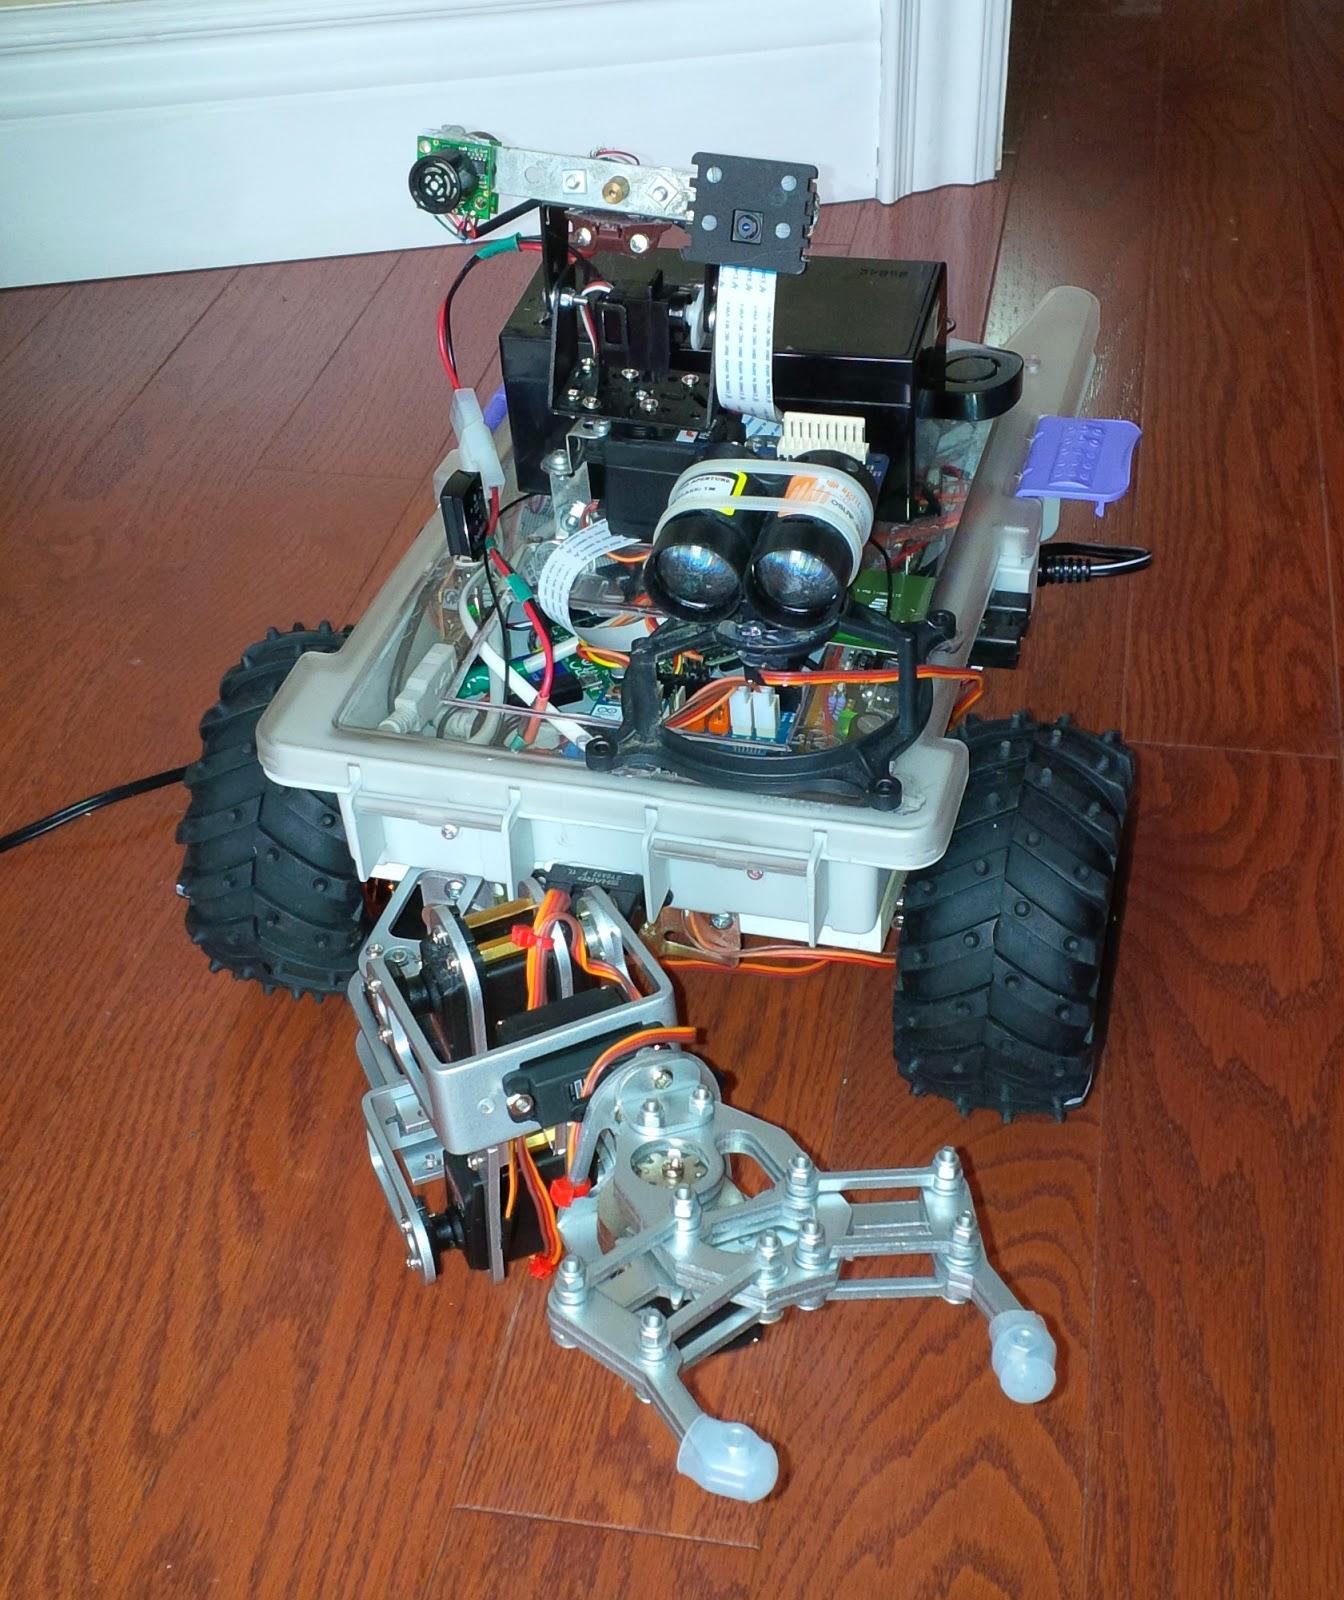 mars rover arduino - photo #16